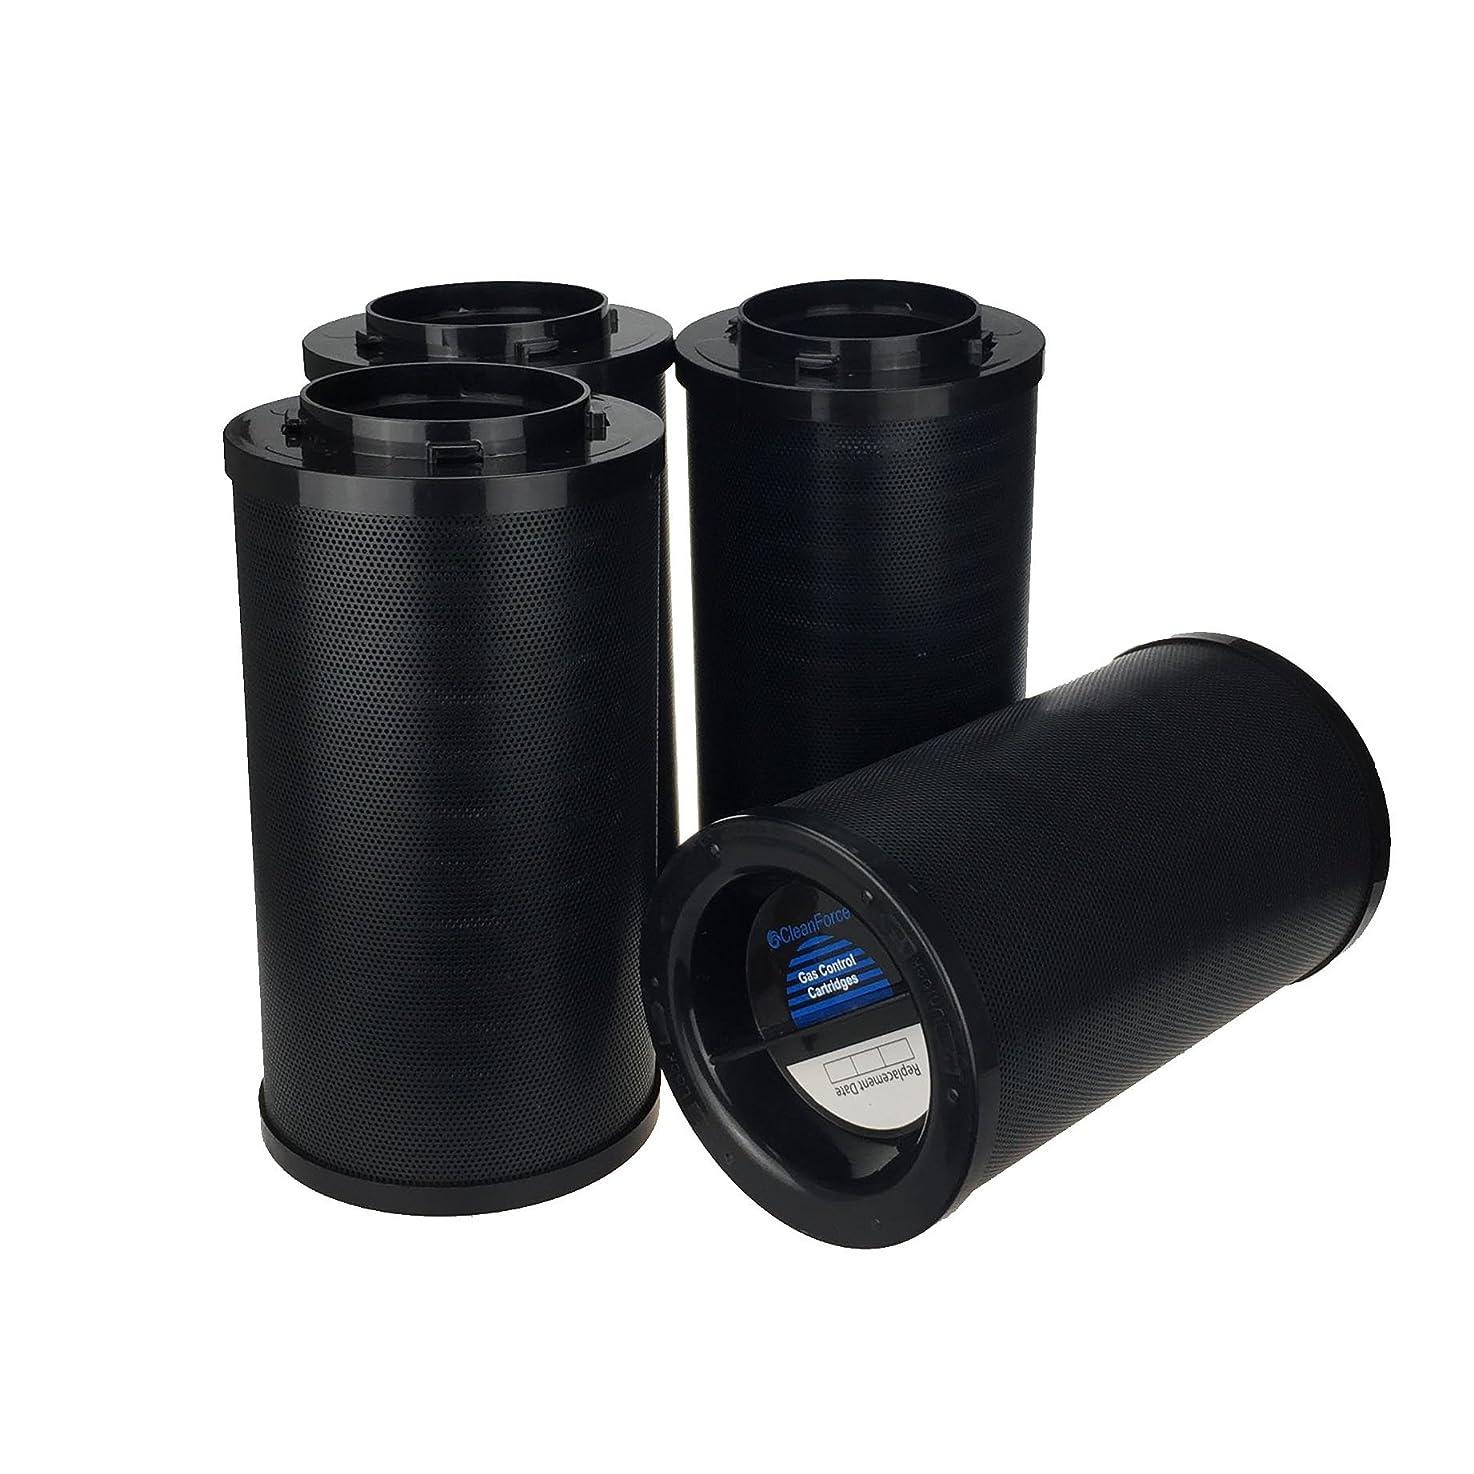 CleanForce MultiGas Cartridges Replacement Filter, Include Post-Filter Sleeves, 4 Pack, Adapt IQAir GC MultiGas Air Purifier